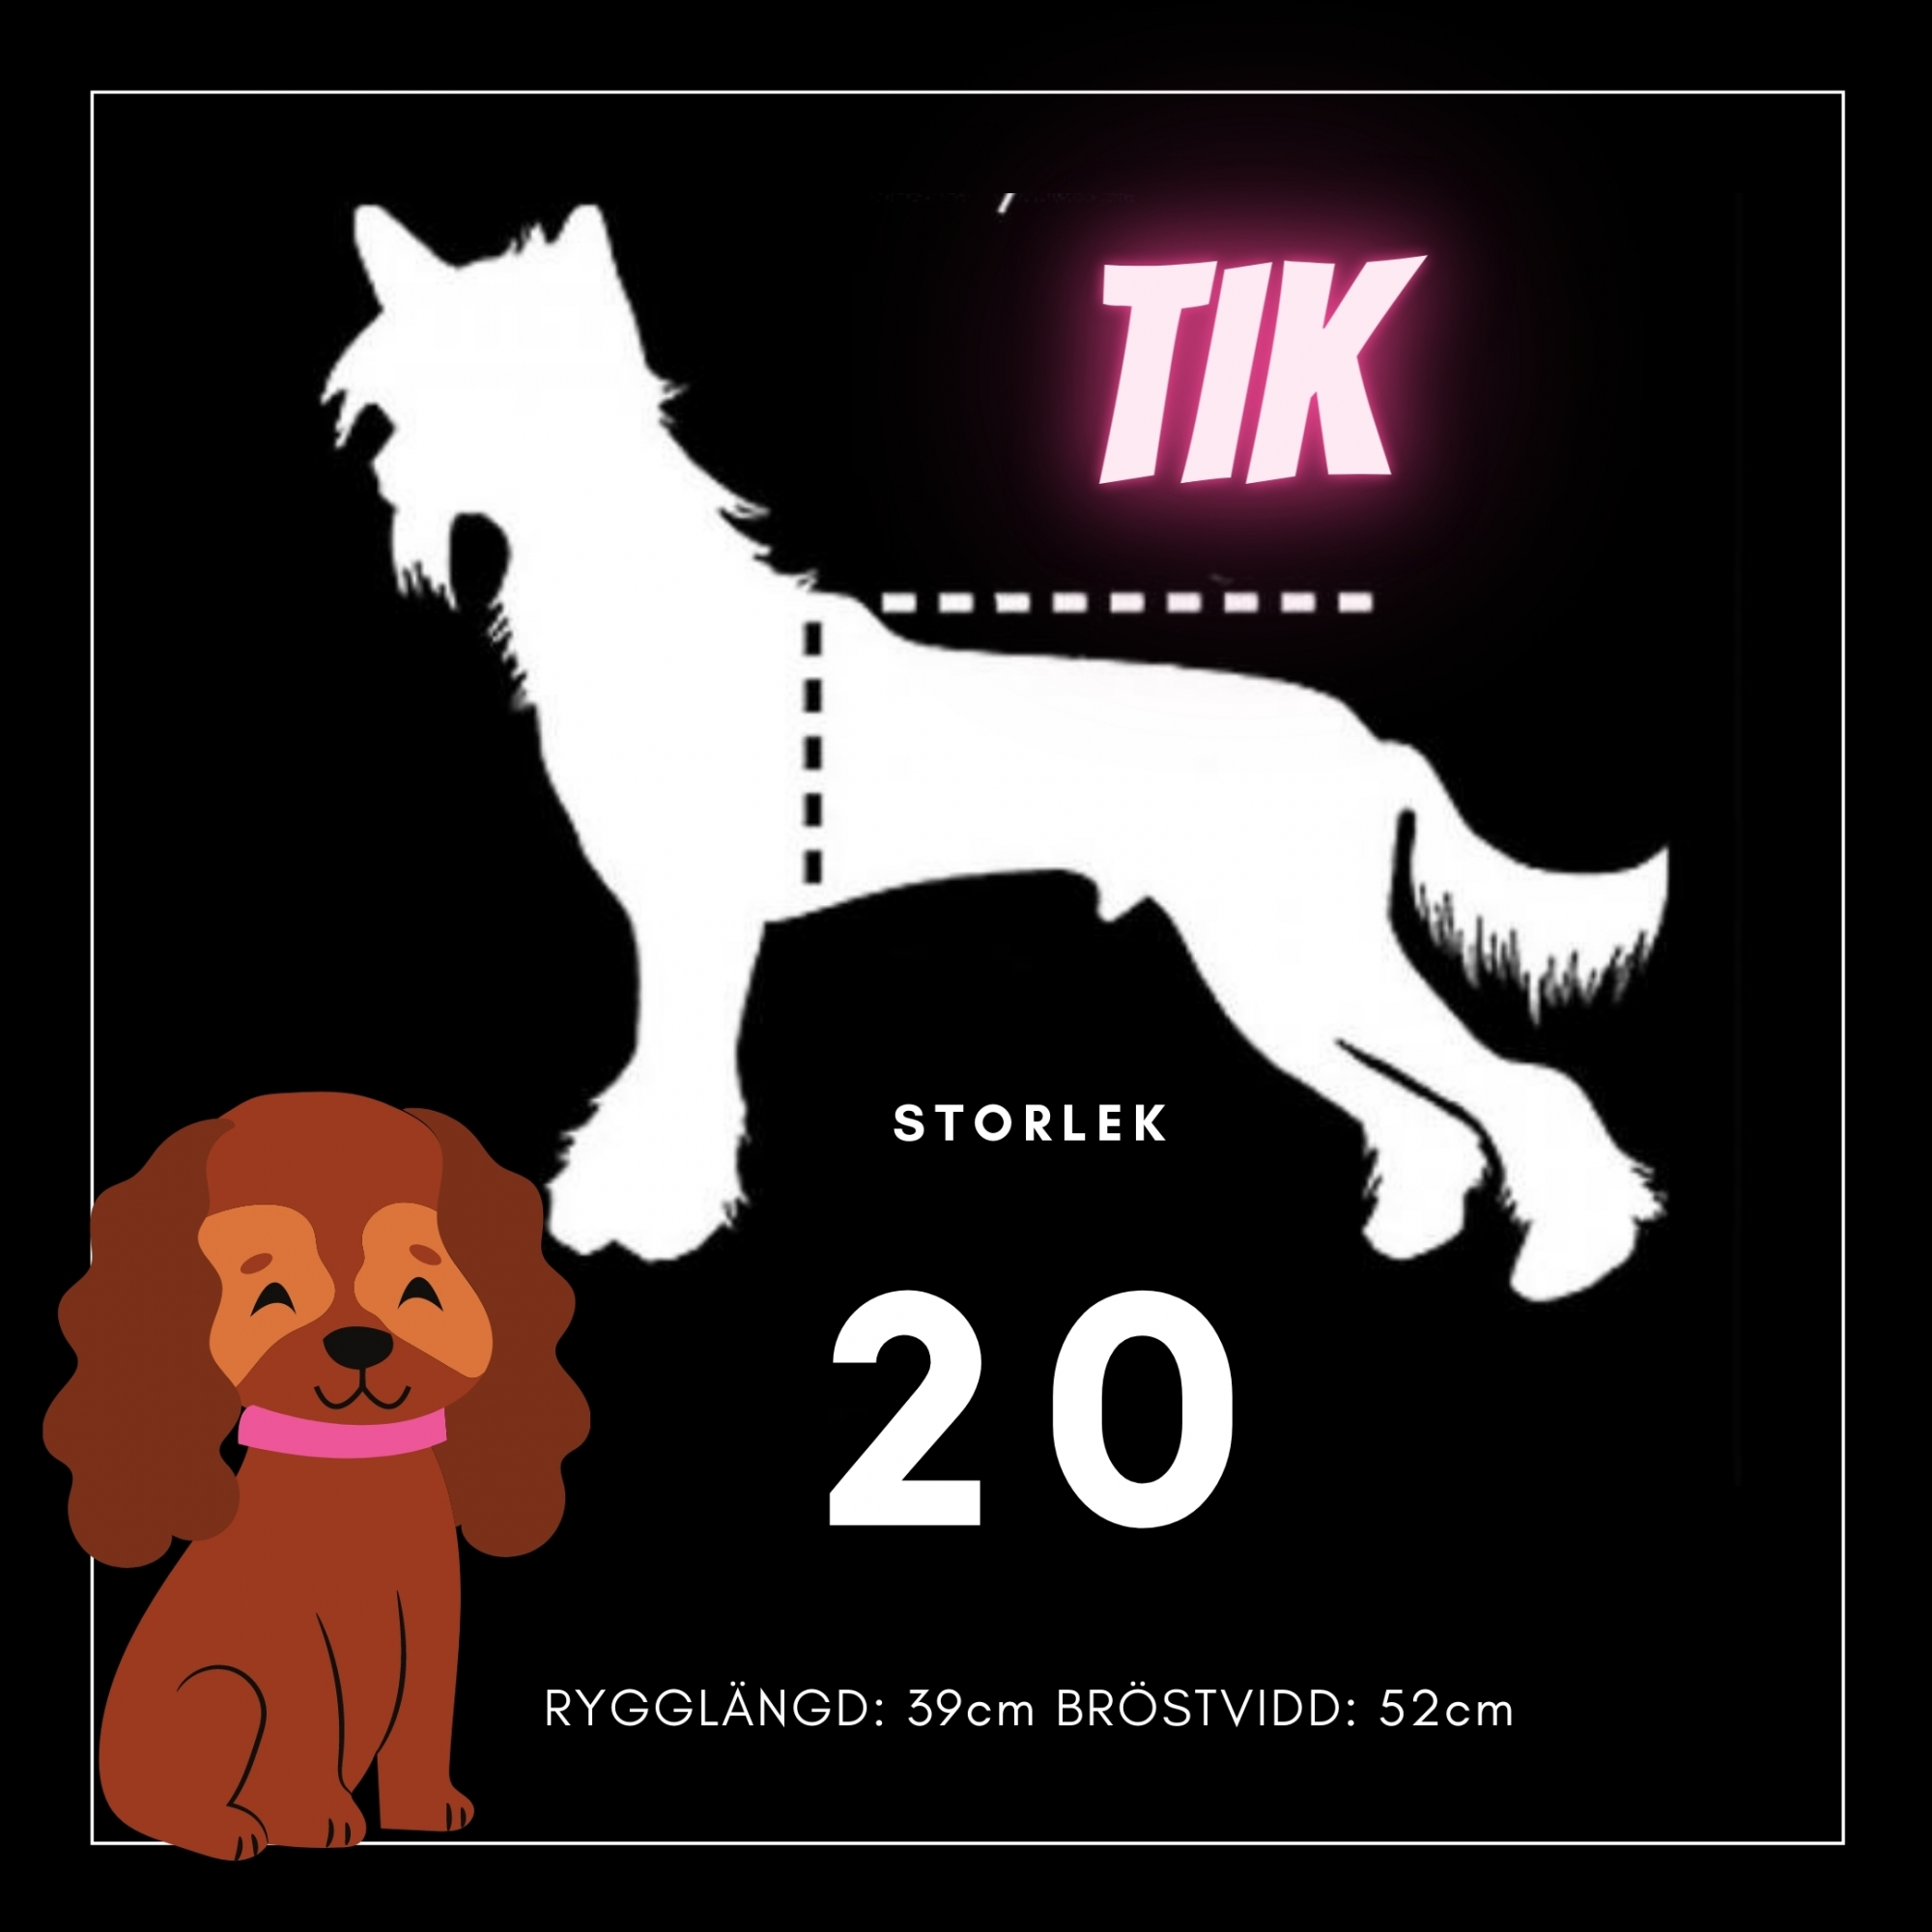 Tik Storlek 20 - Passion For Pet Fashion